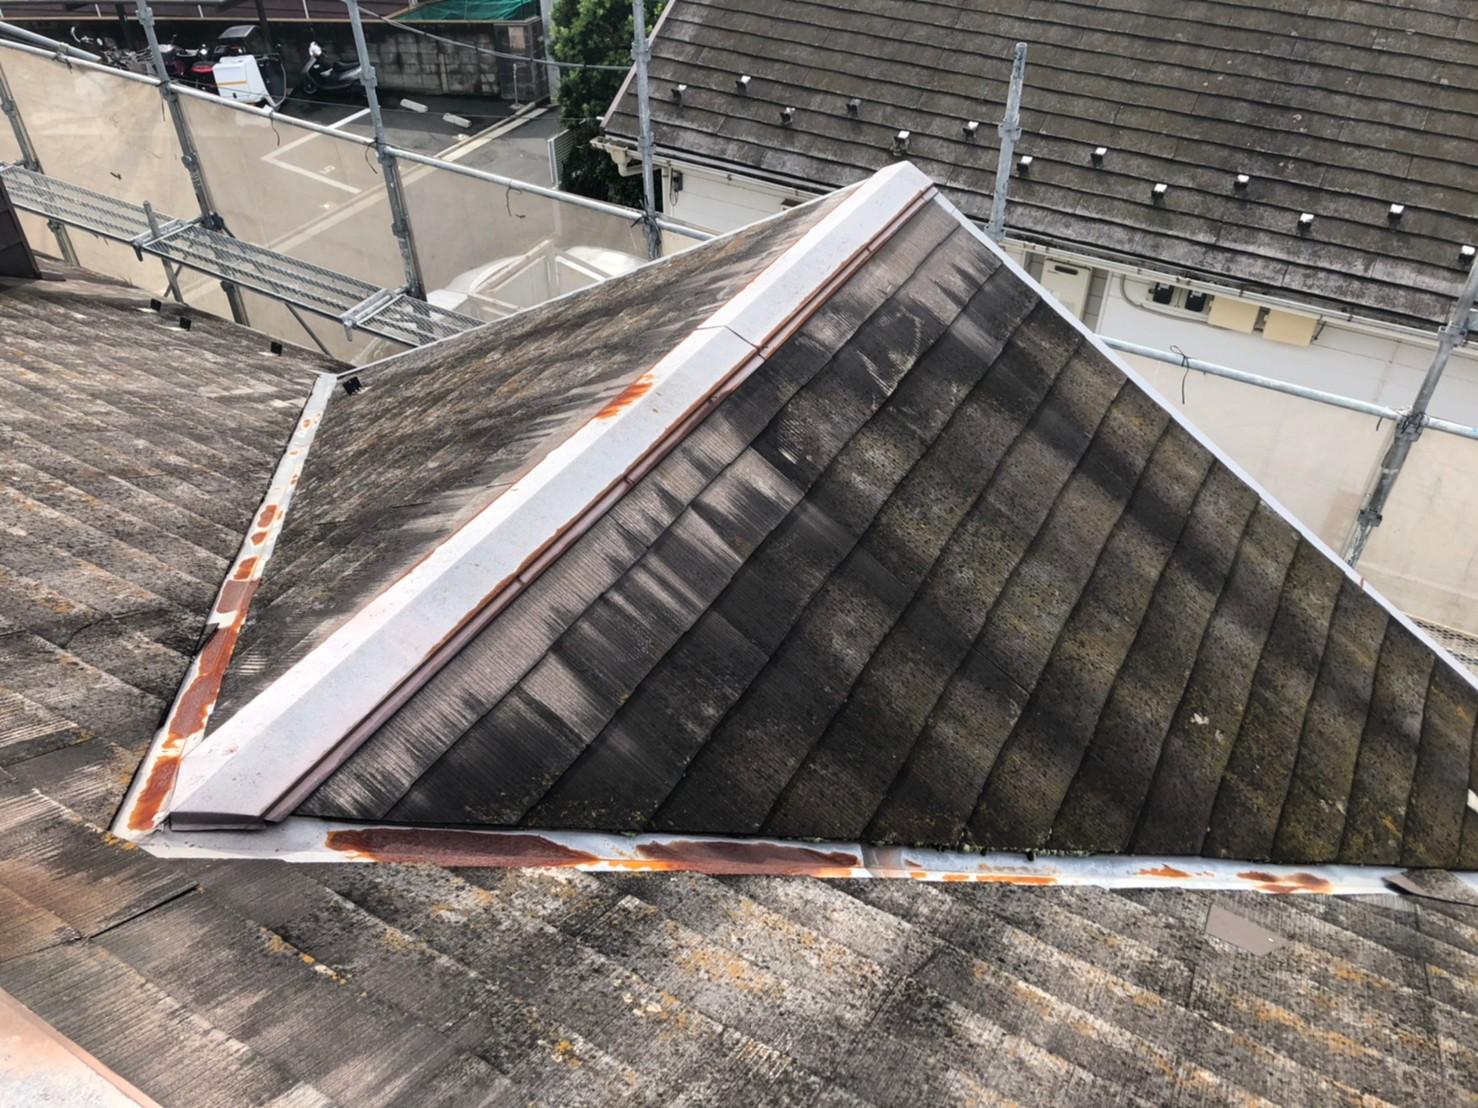 Pアパート屋根工事